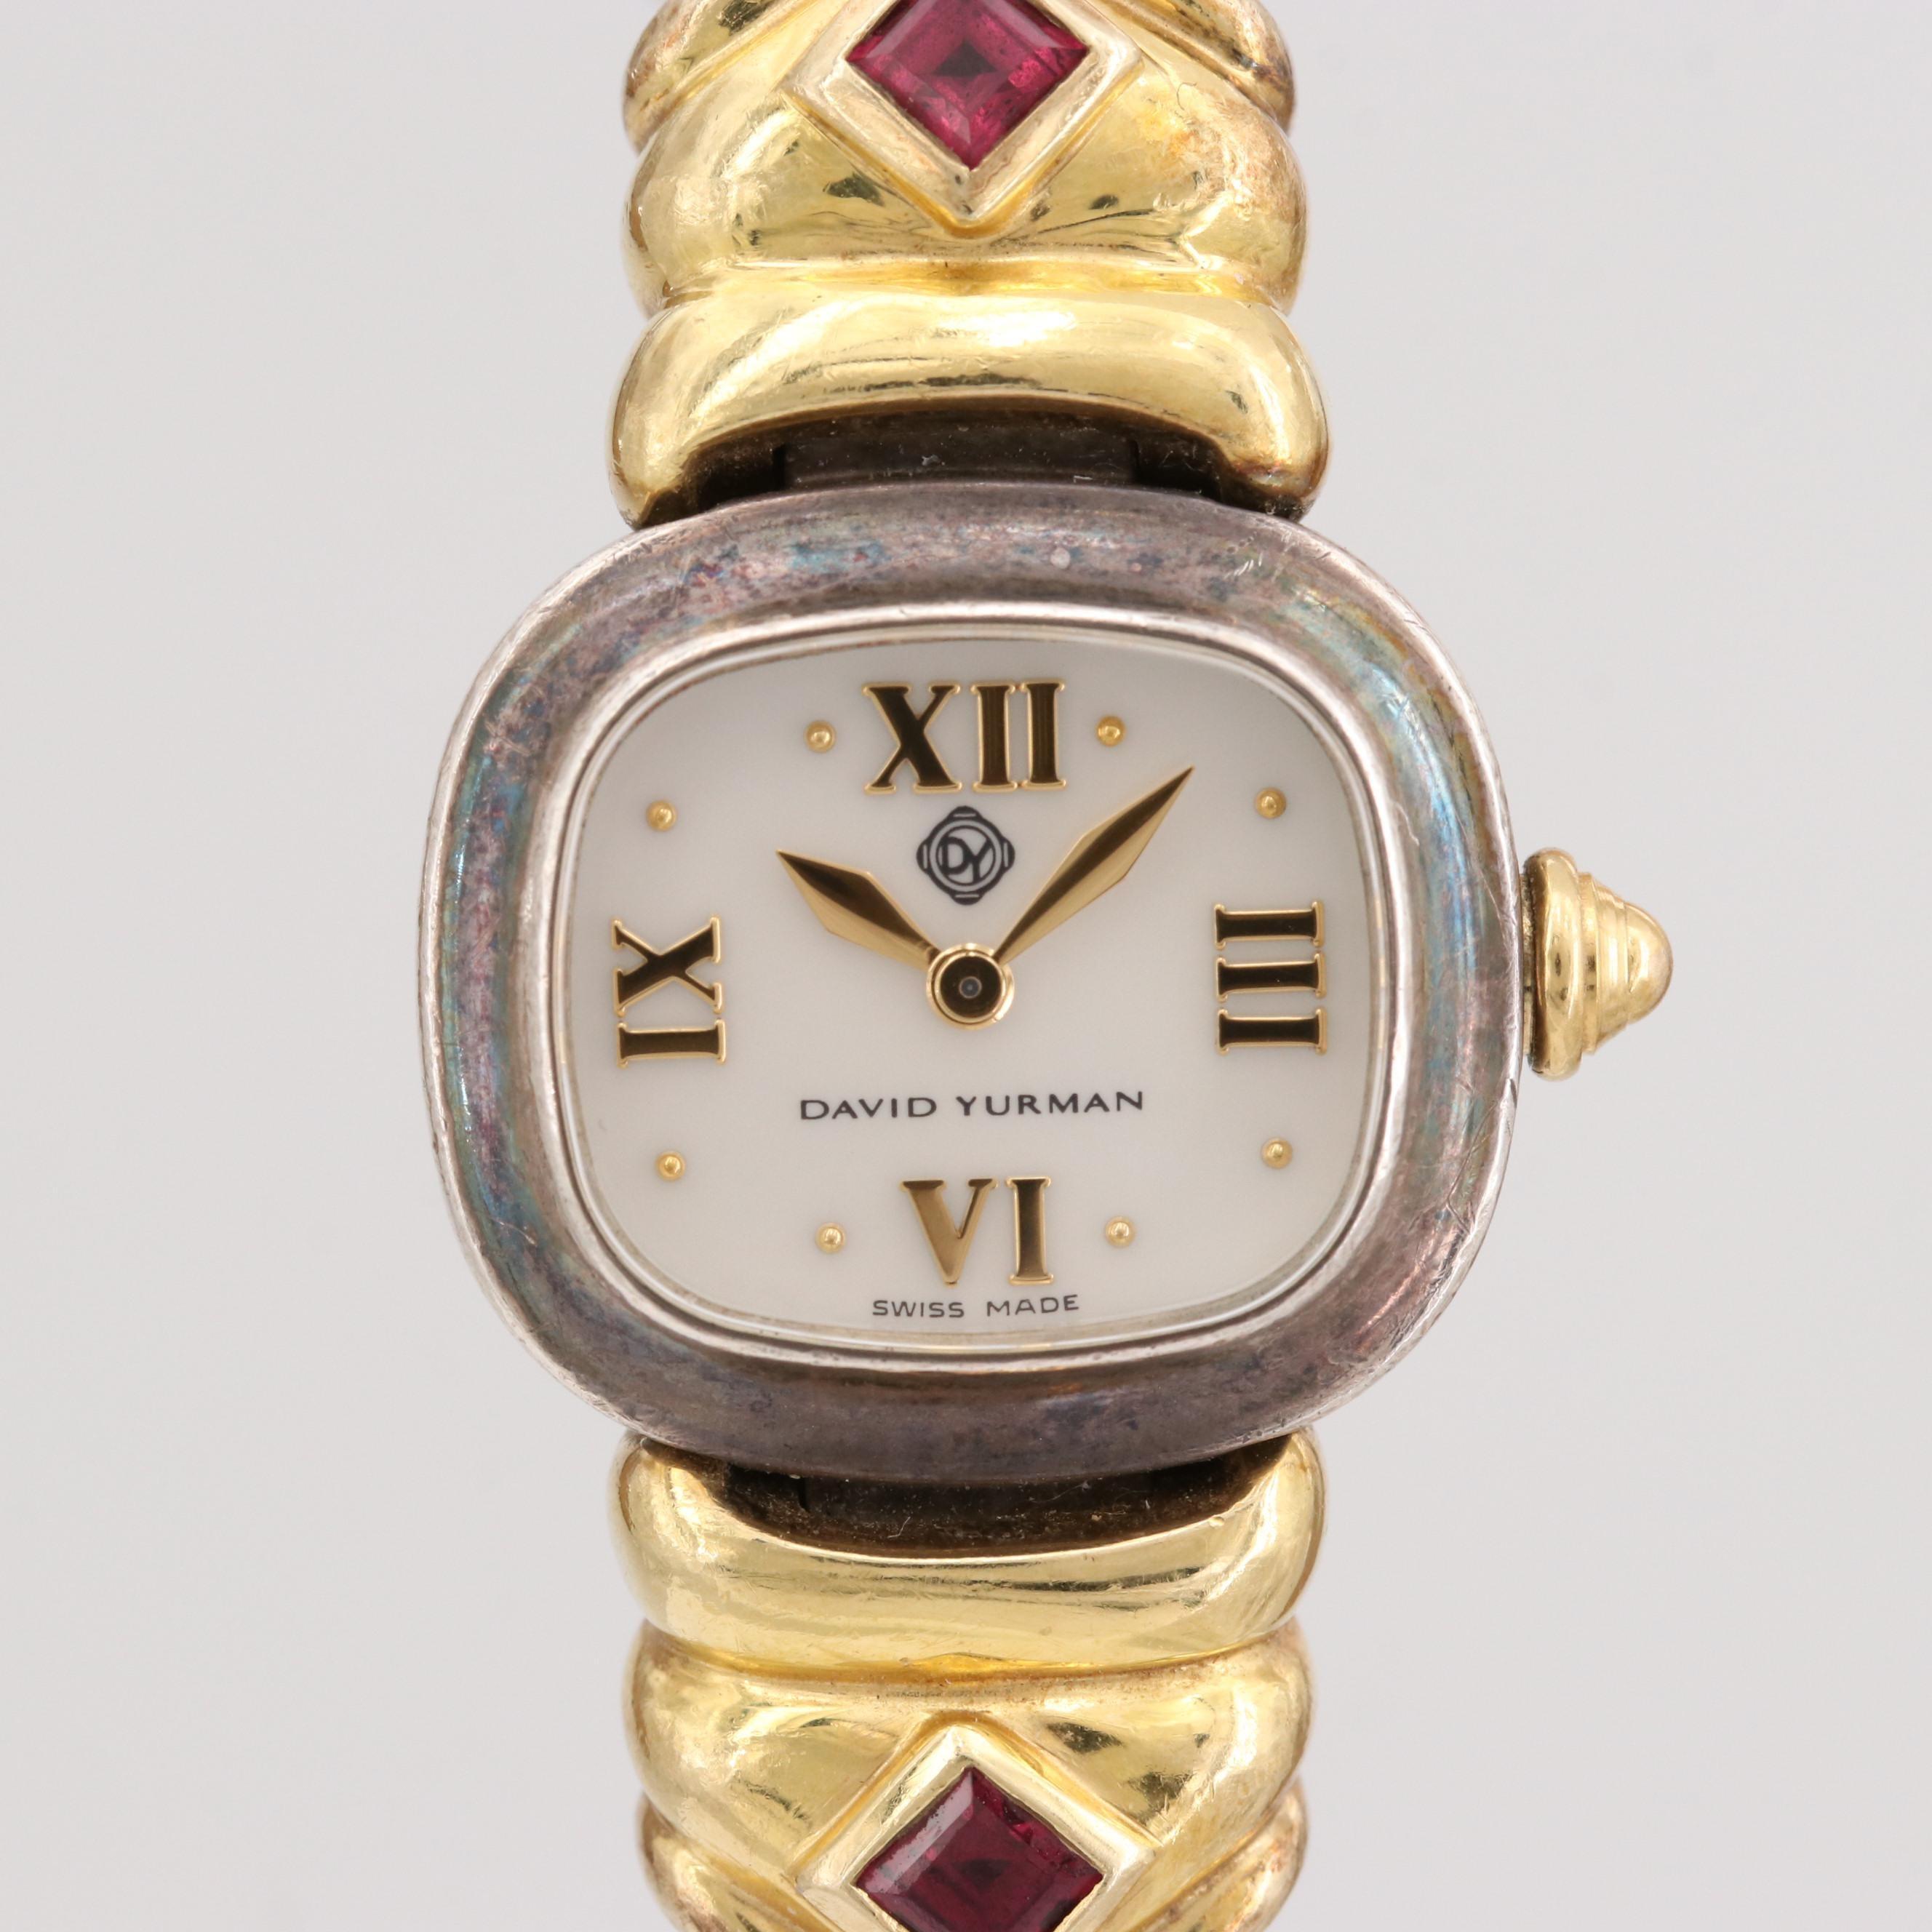 David Yurman Sterling Silver and 18K Yellow Gold Wristwatch With Garnets